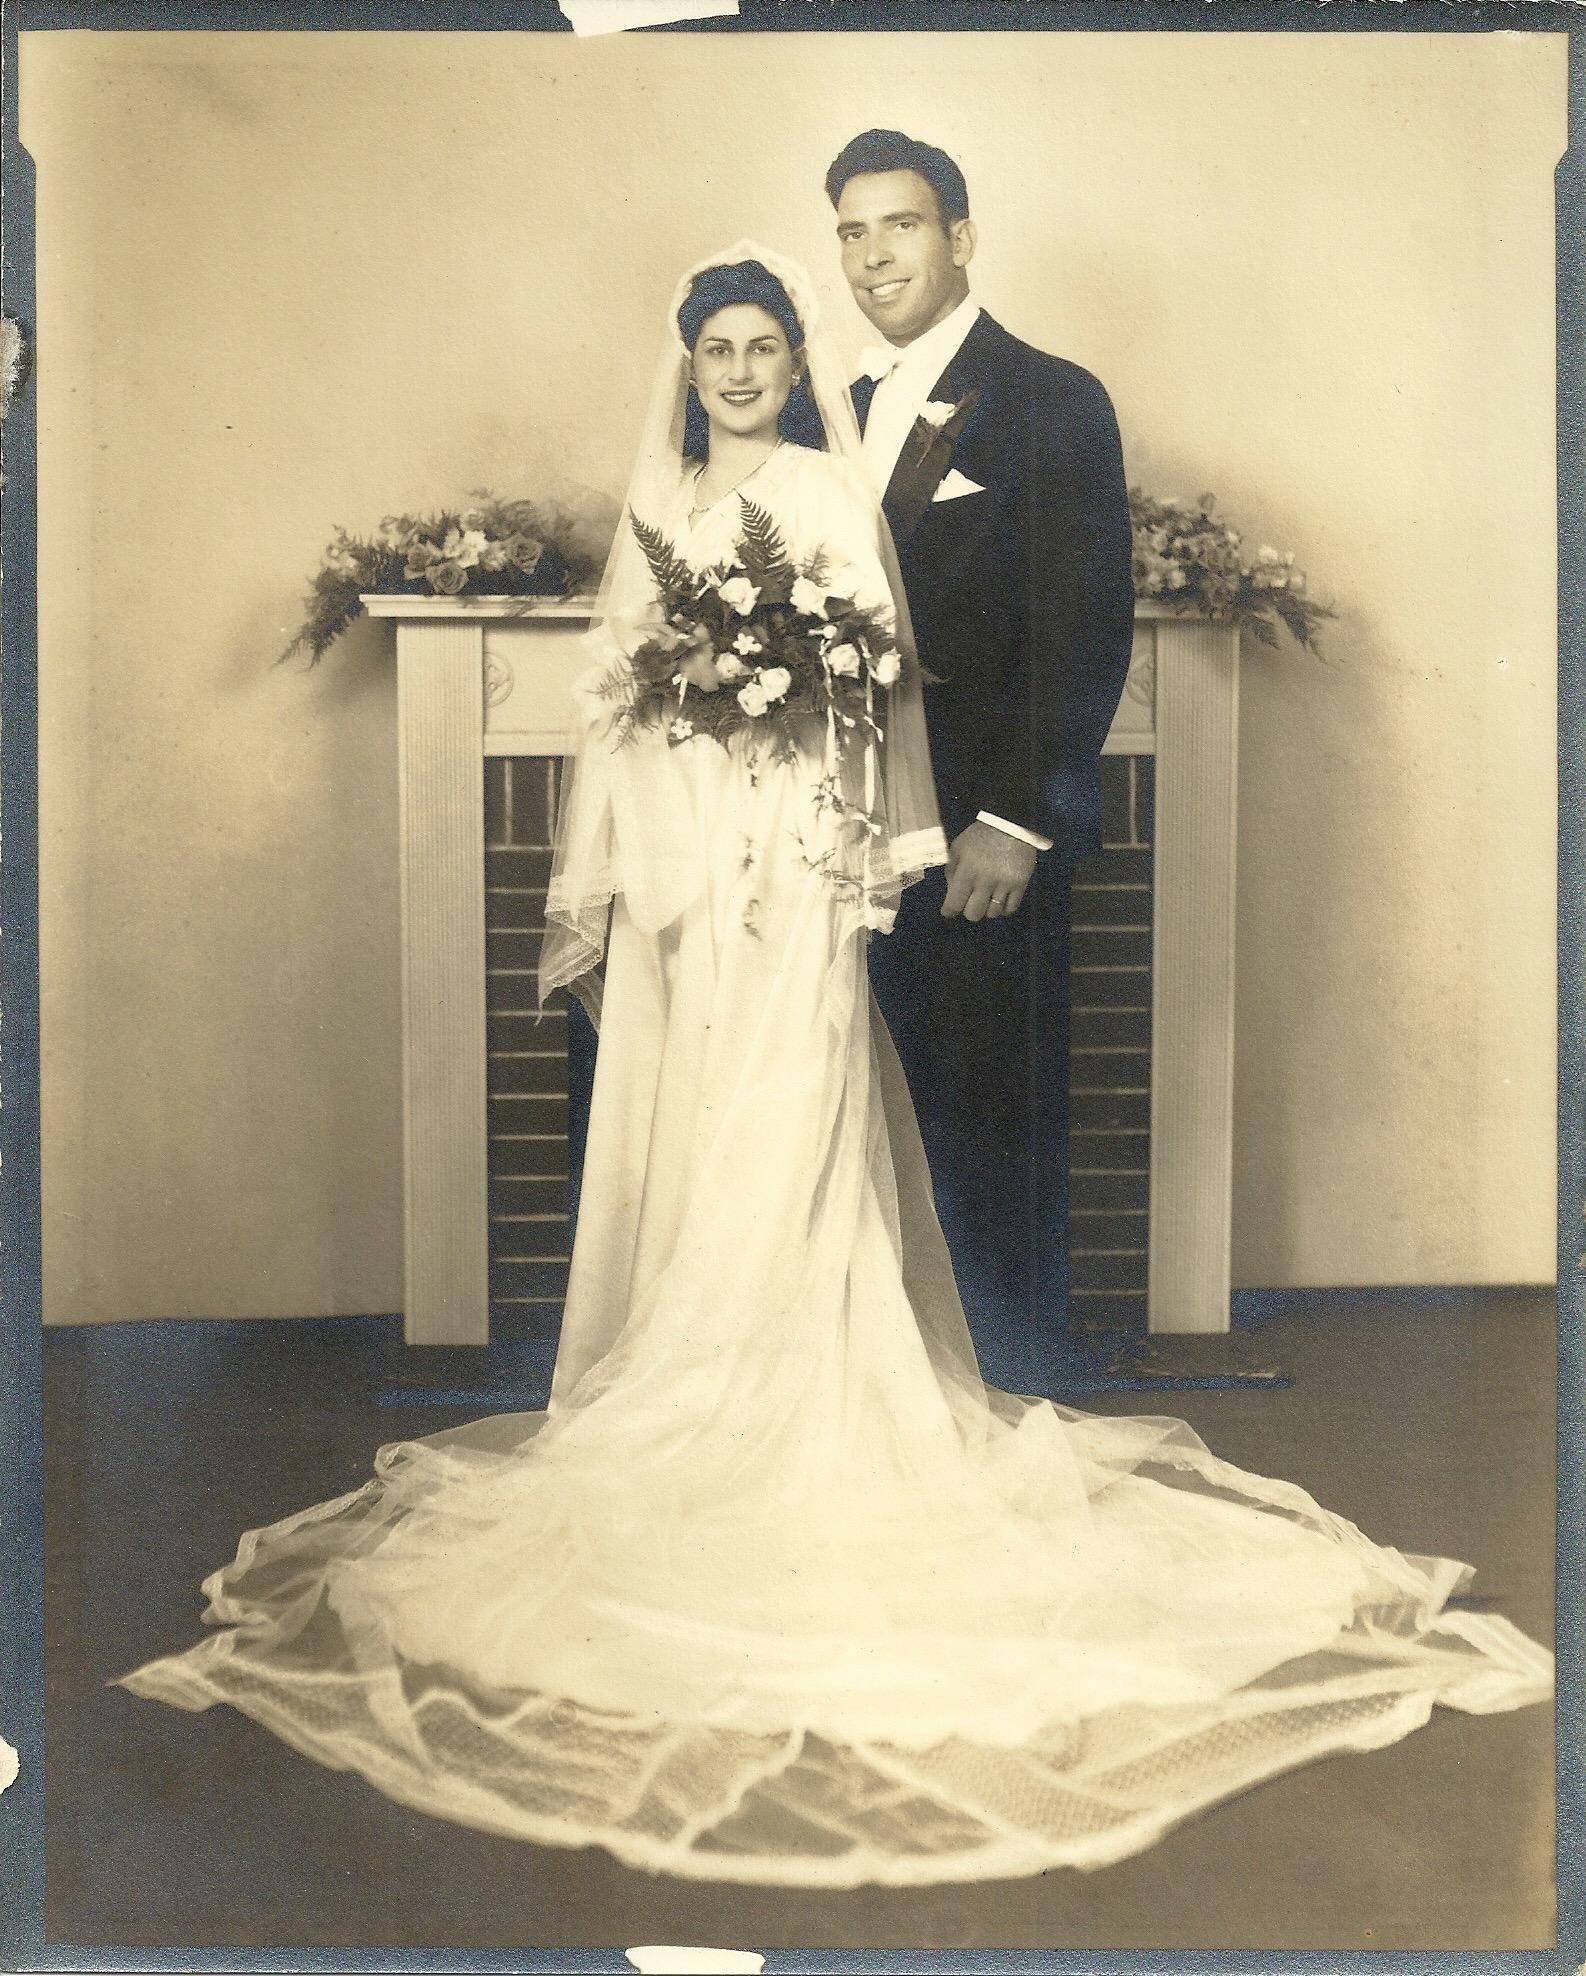 Vintage Wedding Dresses Omaha Ne: My Grandparents On Their Wedding Day 1946